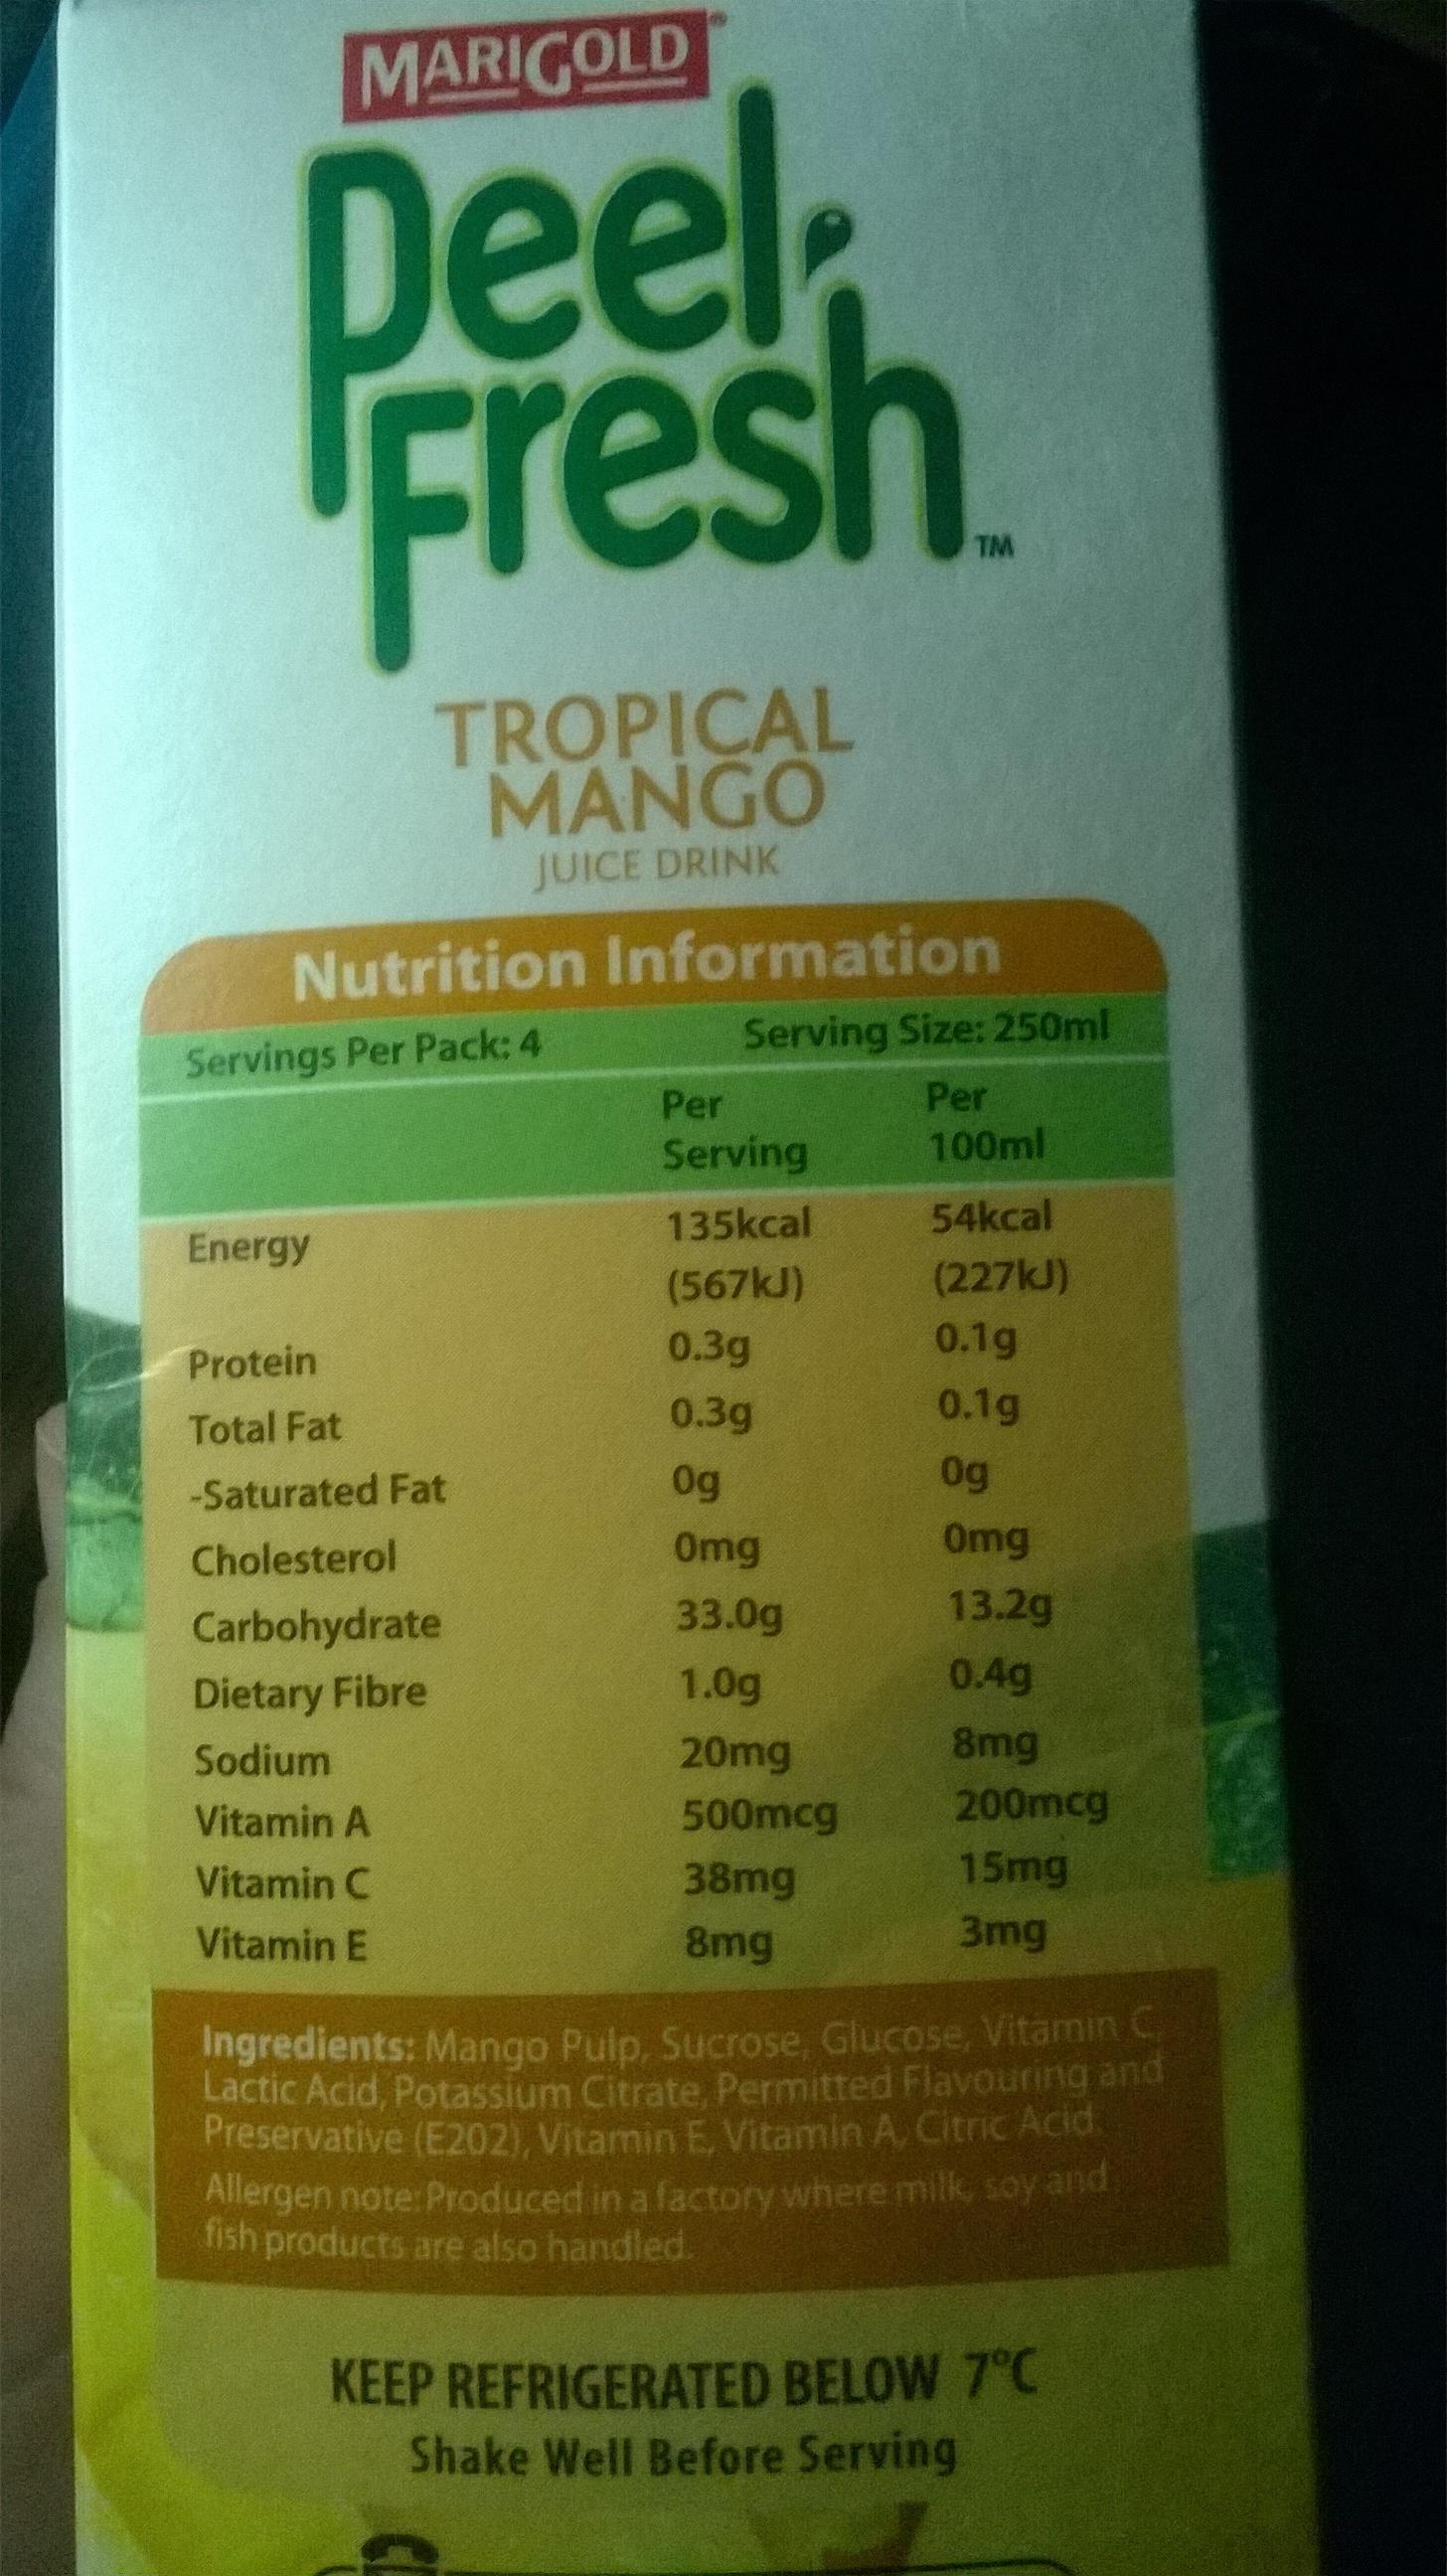 Marigold Peel Fresh Tropical Mango - Product